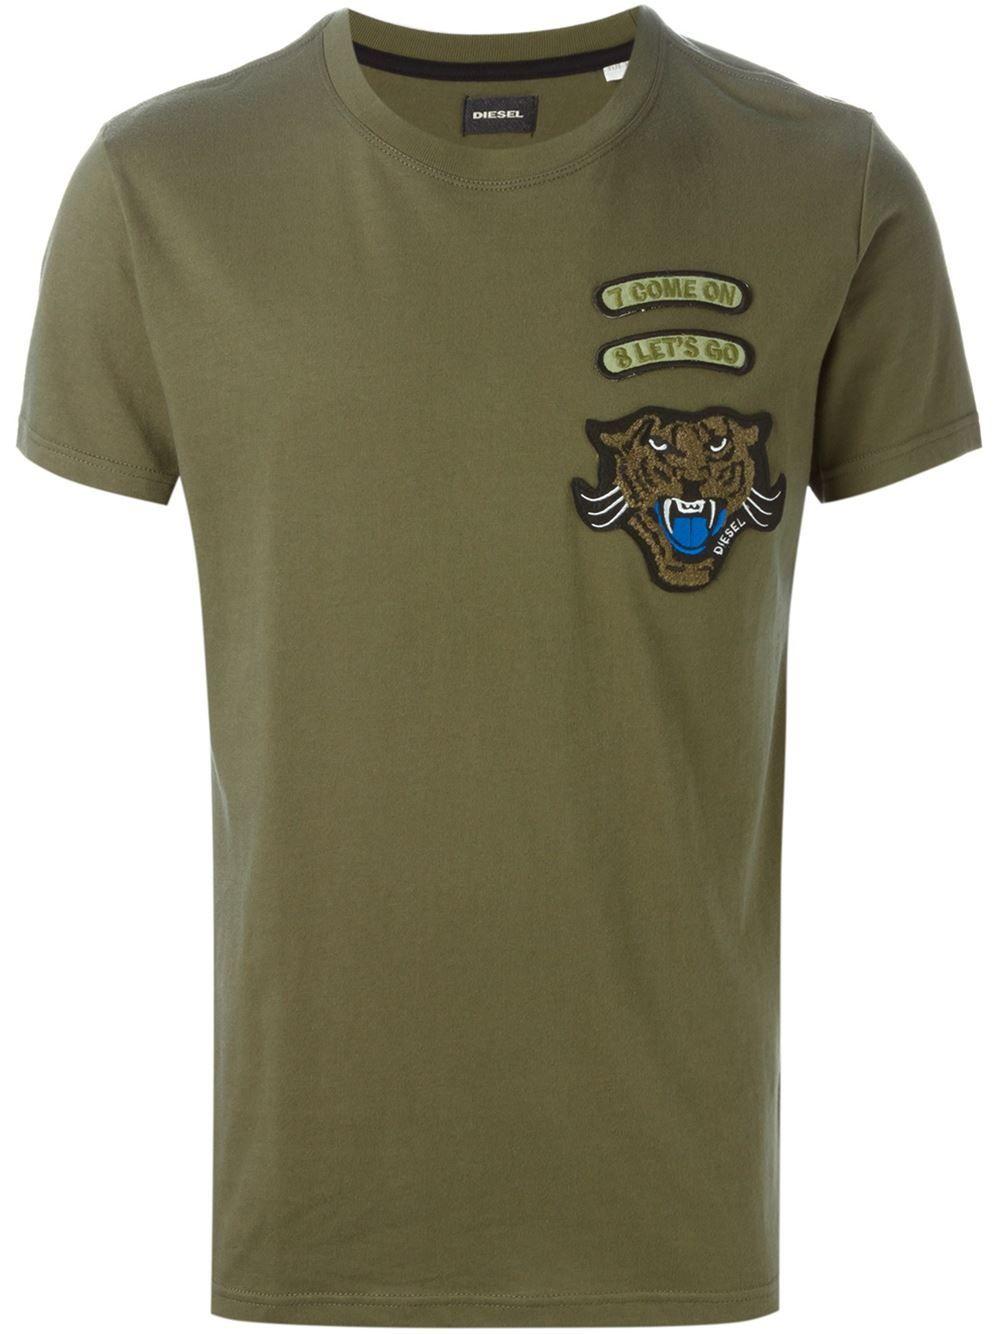 Diesel tiger patch T-shirt Tendências Da Moda 1f9c747f049